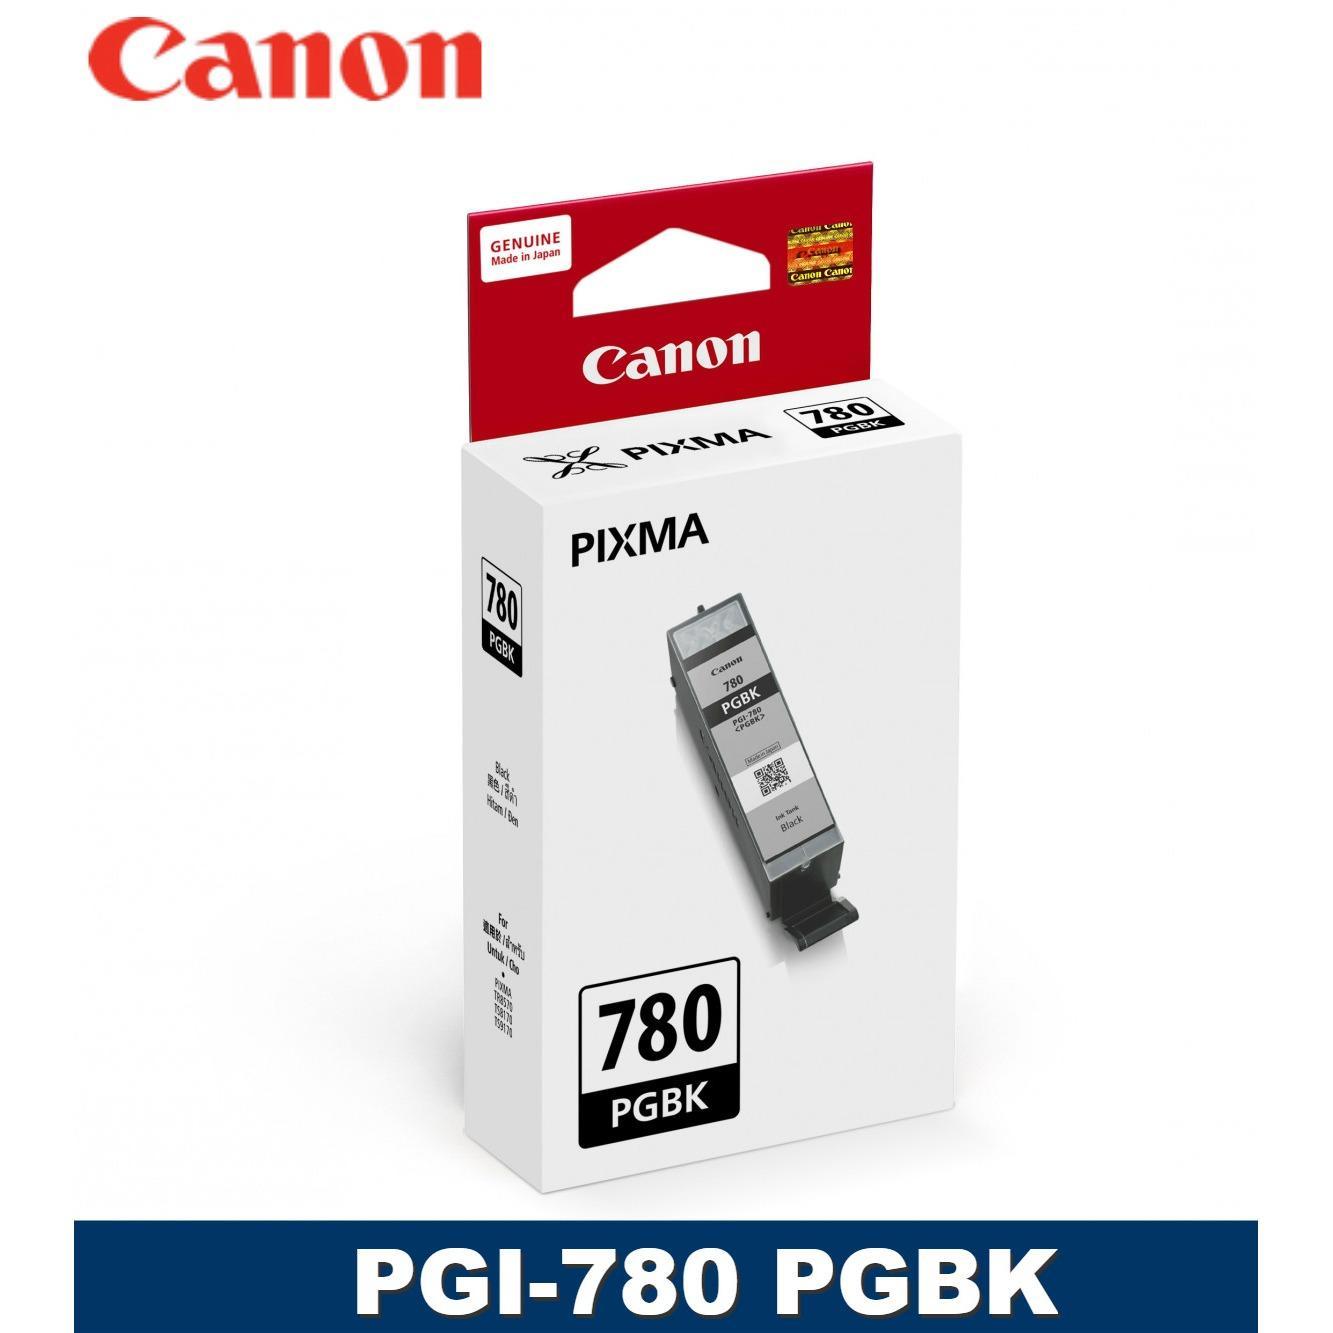 Buy Sell Cheapest Canon 418m Magenta Best Quality Product Deals Ink Cartridge Cli 751 Yellow Xl Original Pgi 780 Pgbk 781 Black Cyan Photo